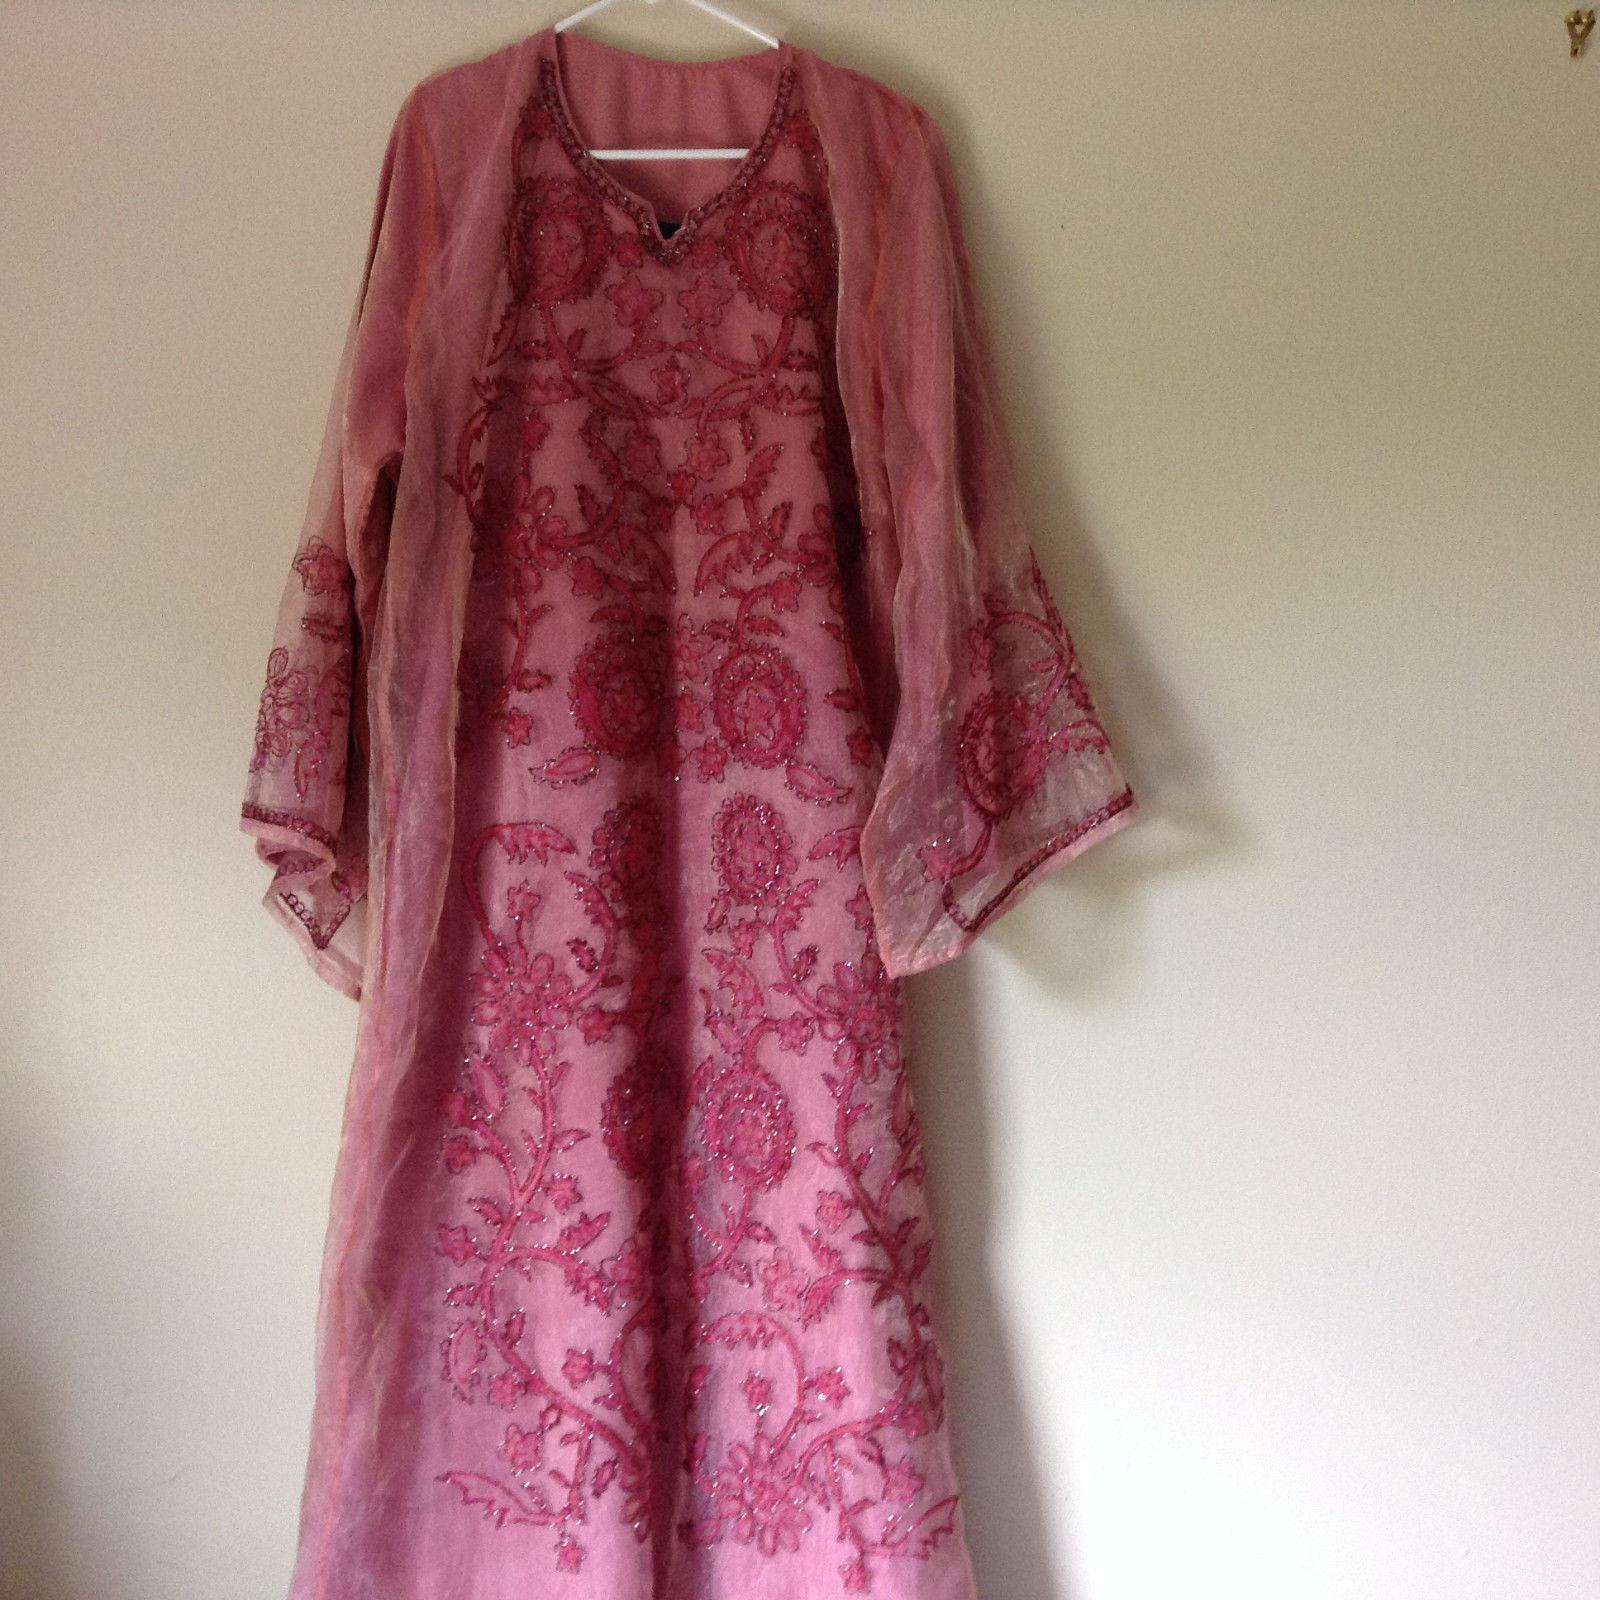 Ceremonial Light Pink Dress Shefoun Fashion Group Series Measurements Below